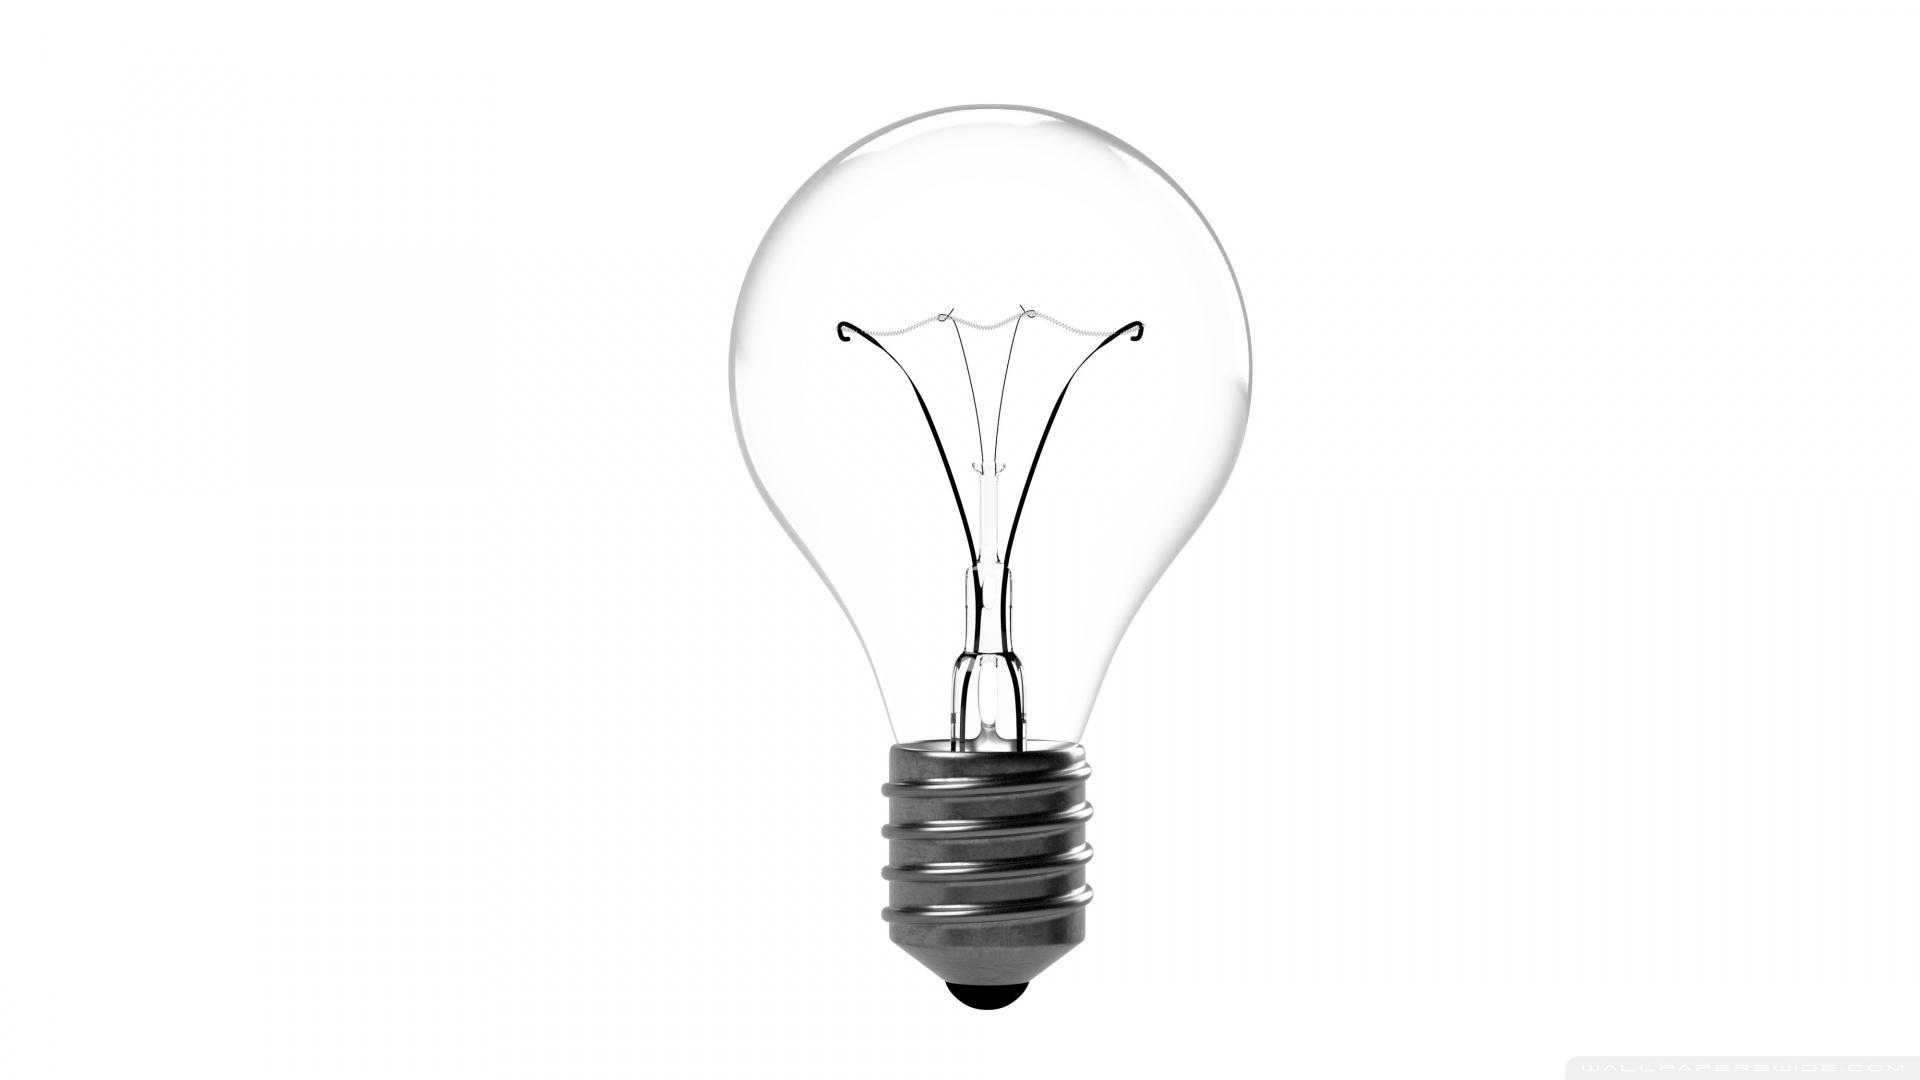 Incandescent Light Bulb 4K HD Desktop Wallpaper for 4K Ultra HD 1920x1080